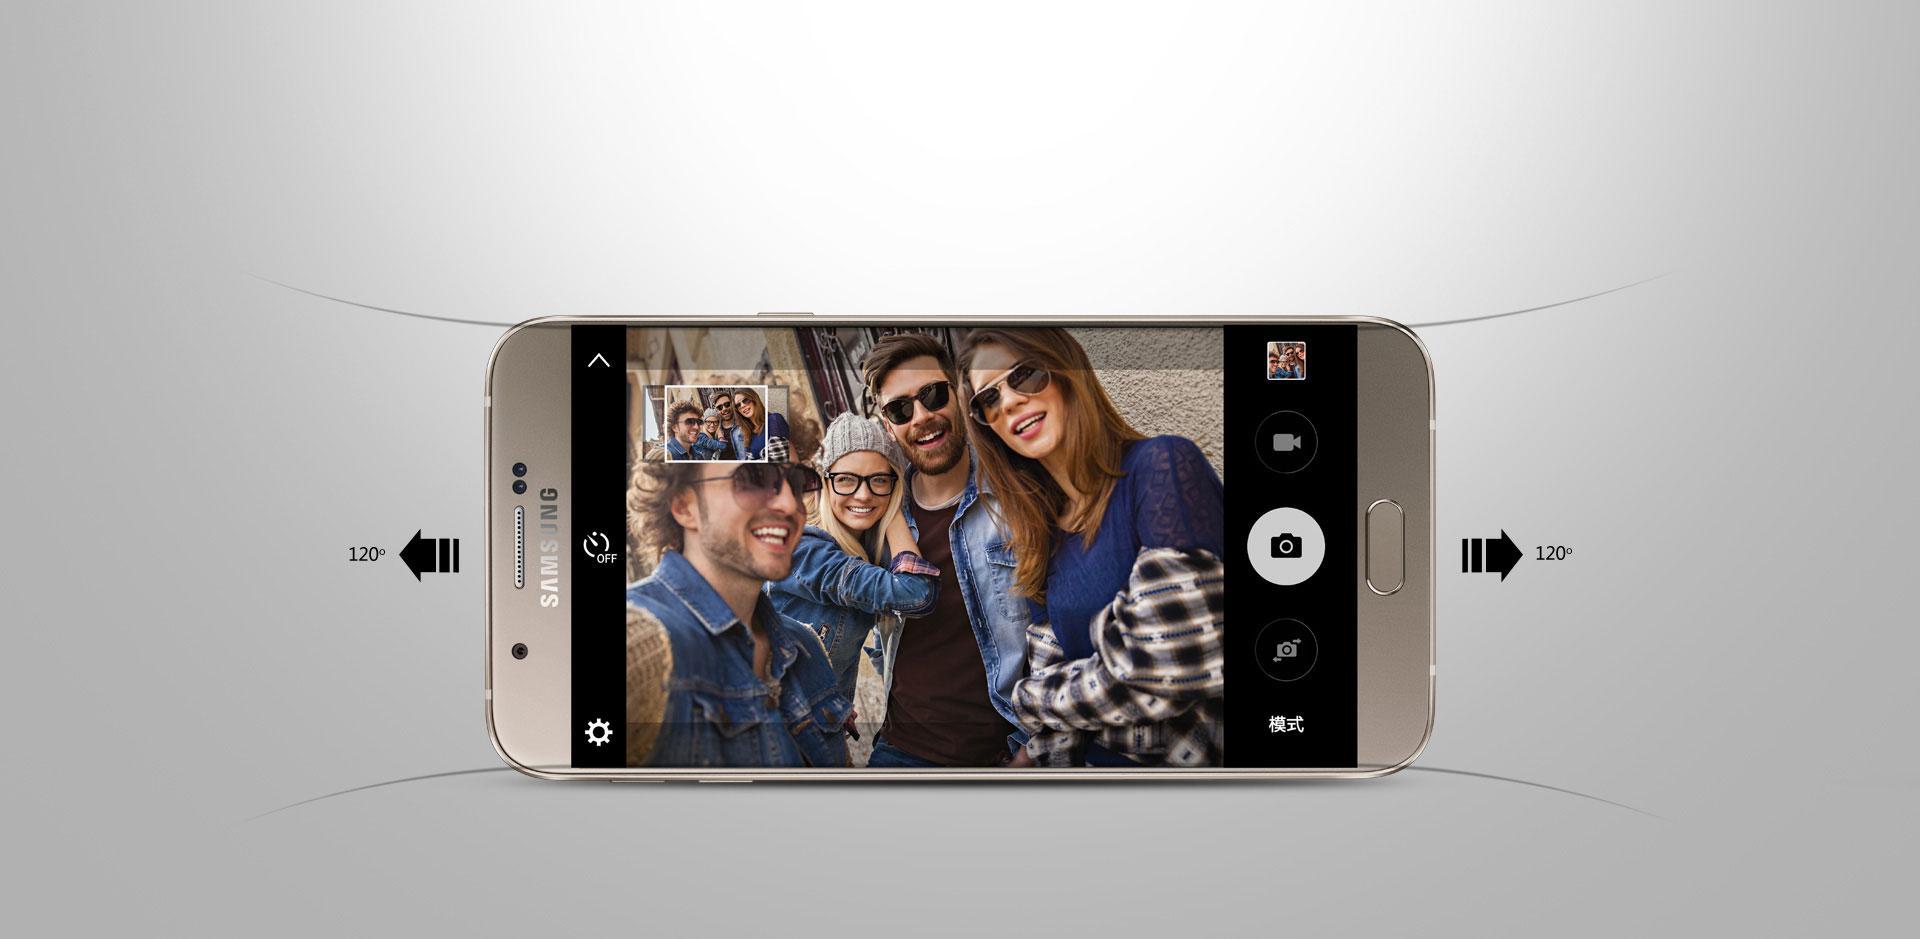 Samsung Galaxy A8 selfie de grupo